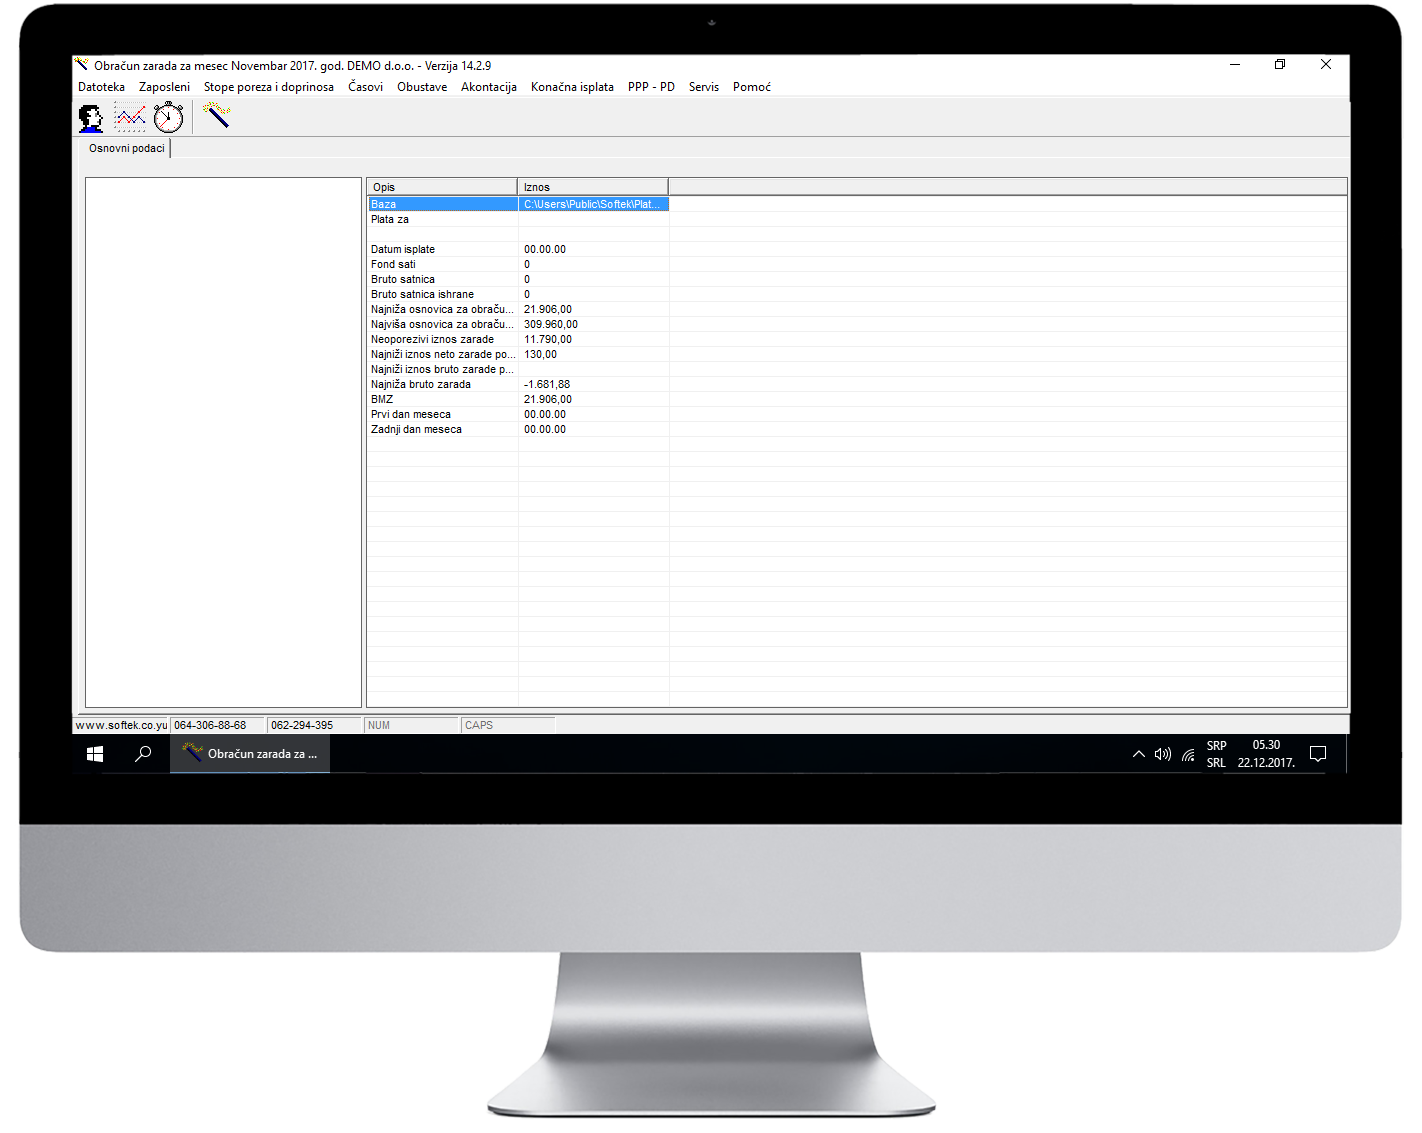 softver-obracun-zarada-monitor